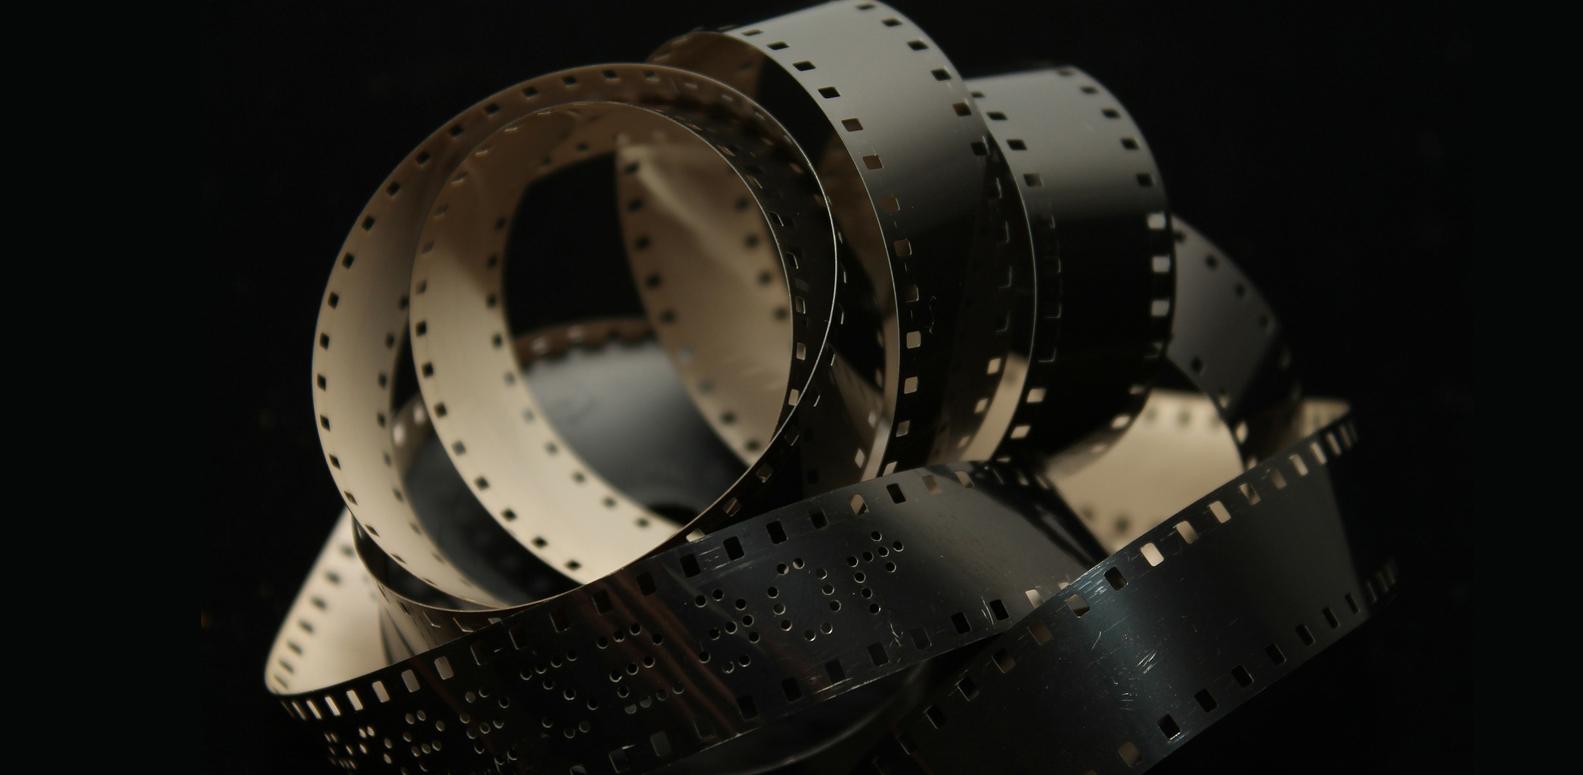 Strip of Film